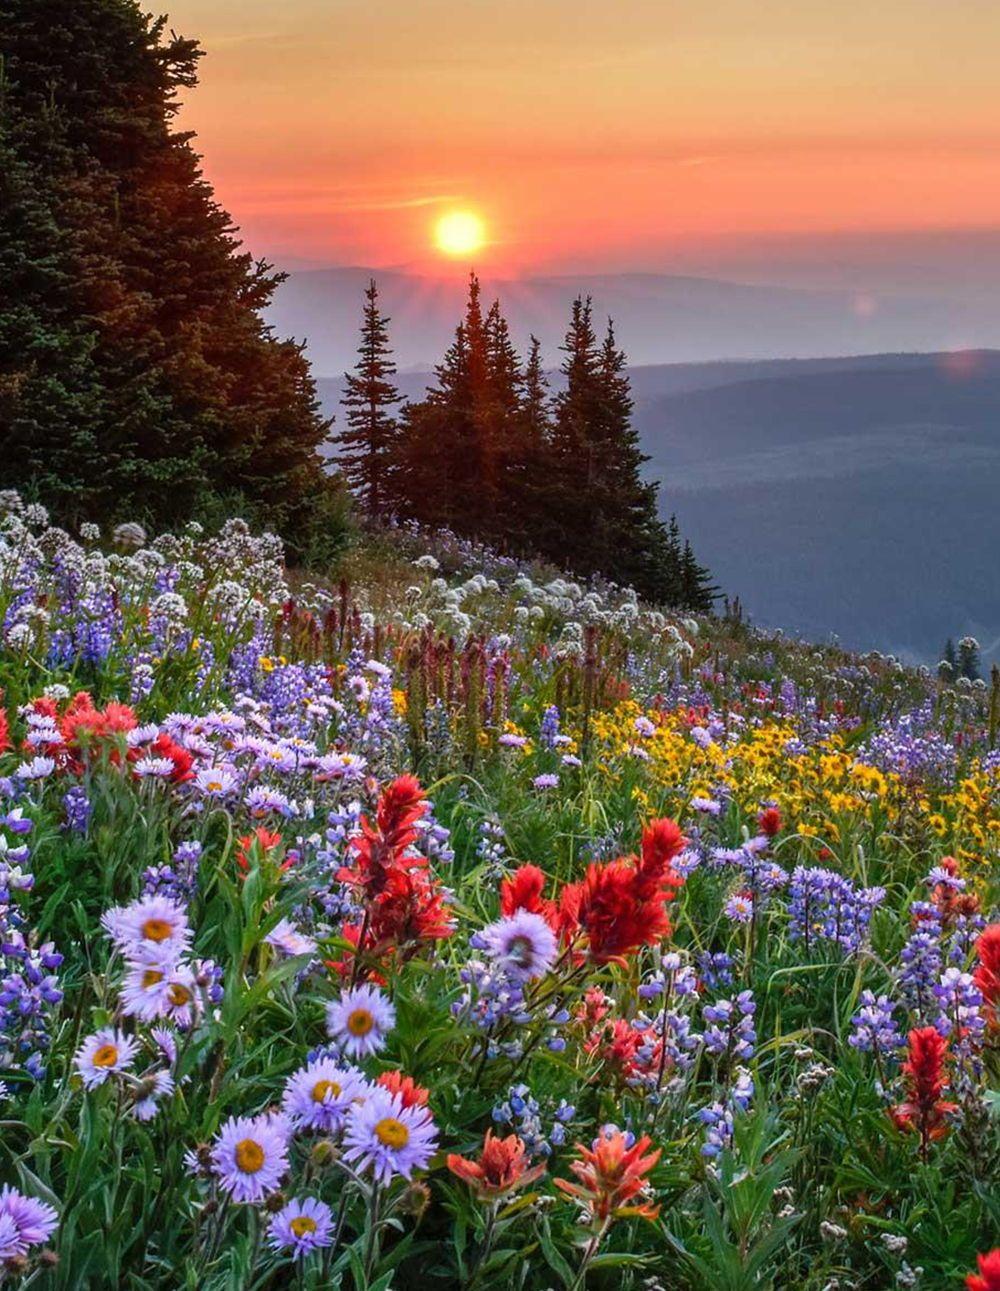 6 Reasons Why You Should Visit Sun Peaks This Summer Road Affair Beautiful Nature Nature Aesthetic Beautiful Sunset